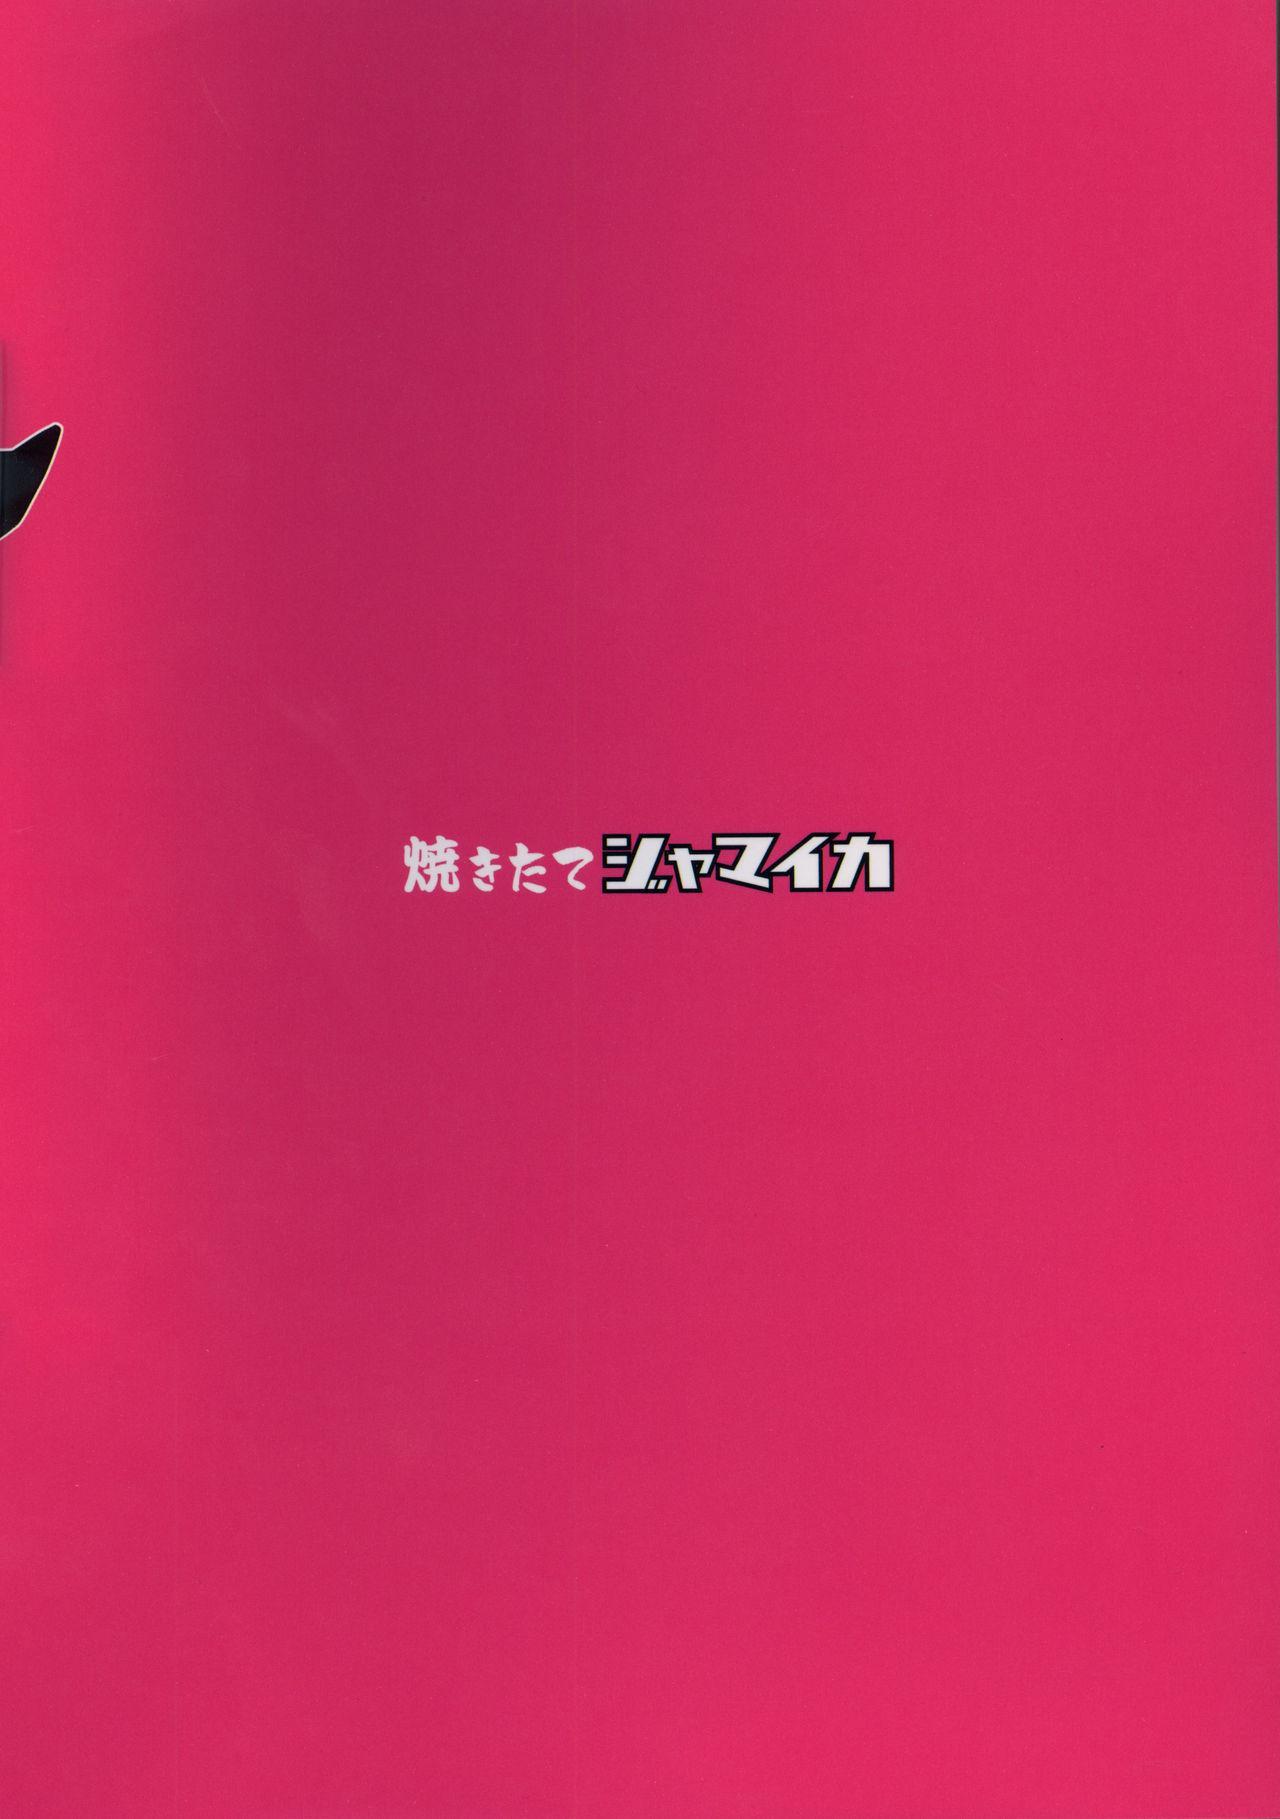 Chinpo Yakuza Miporin 5 Maho Chovy Junai Hen 丨肉棒極道美穗 5 真穗丘比純愛篇 26